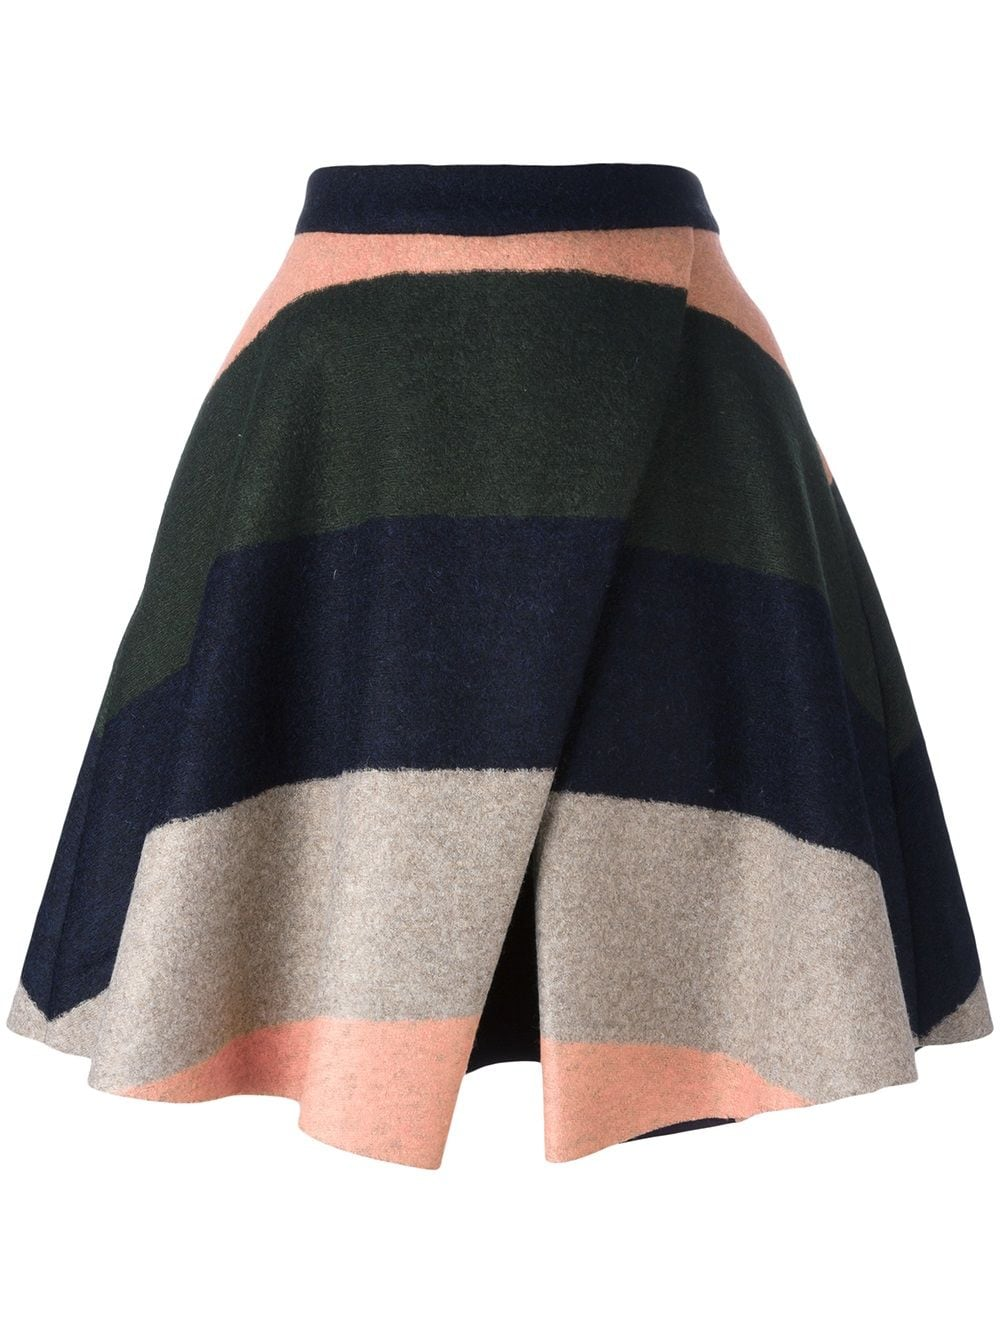 Henrik Vibskov 'Lotus' skirt